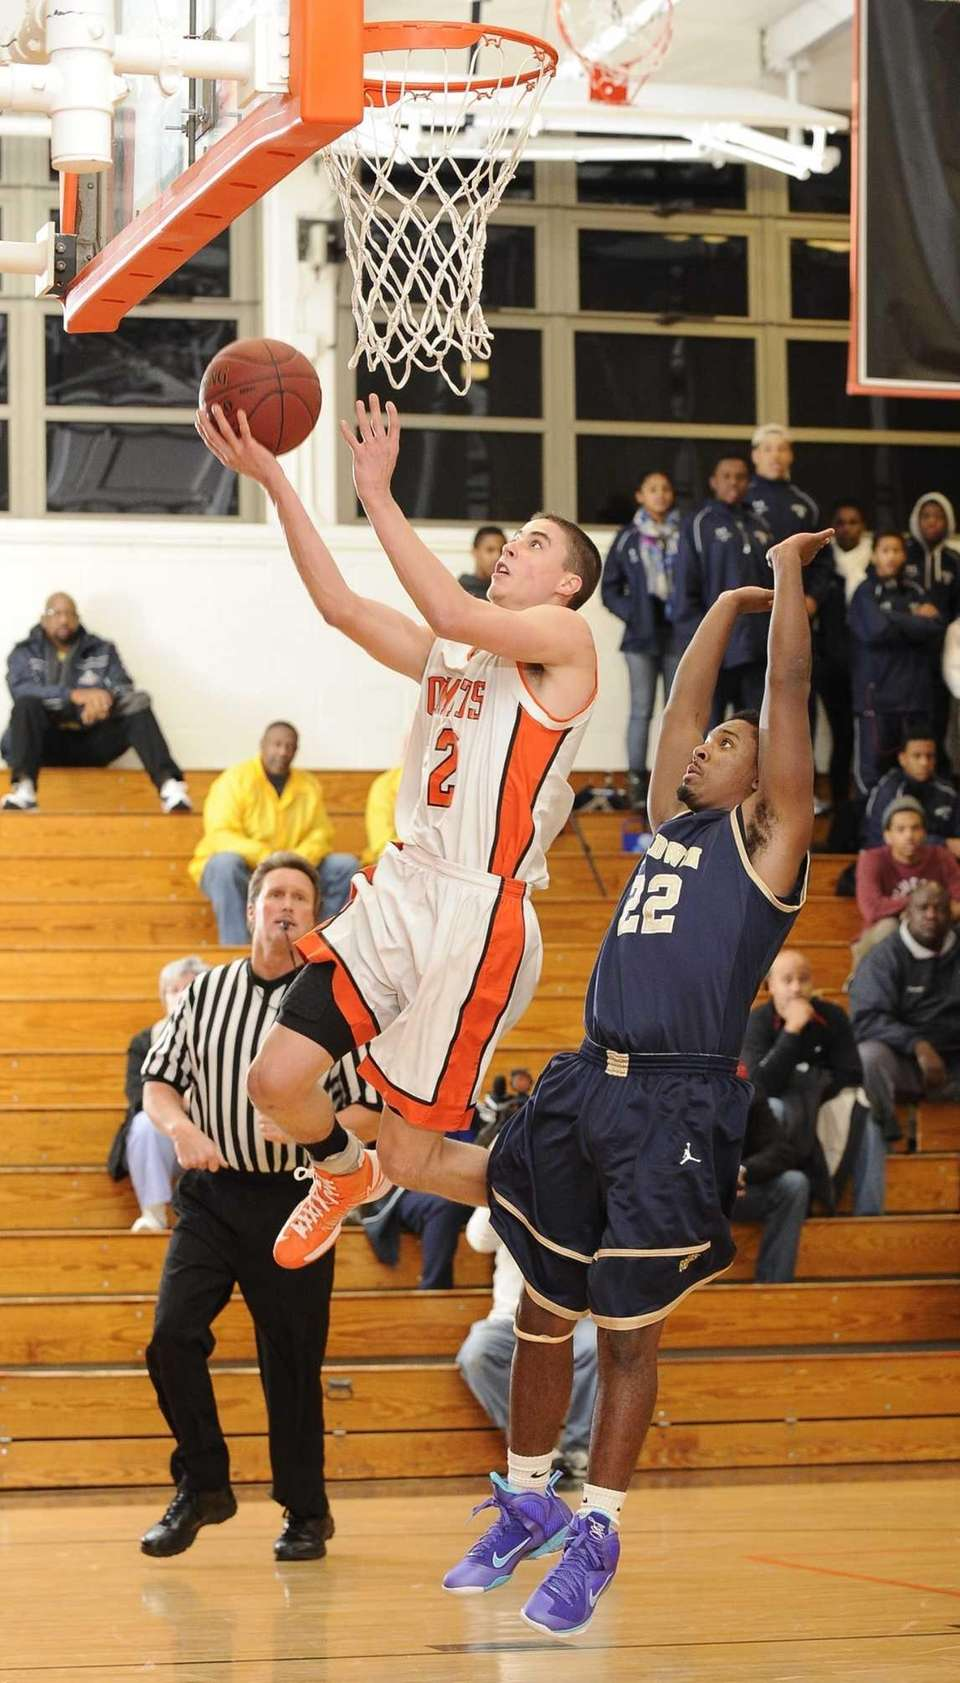 Hicksville's Nick Ptrucelli shoots a layup while Baldwin's